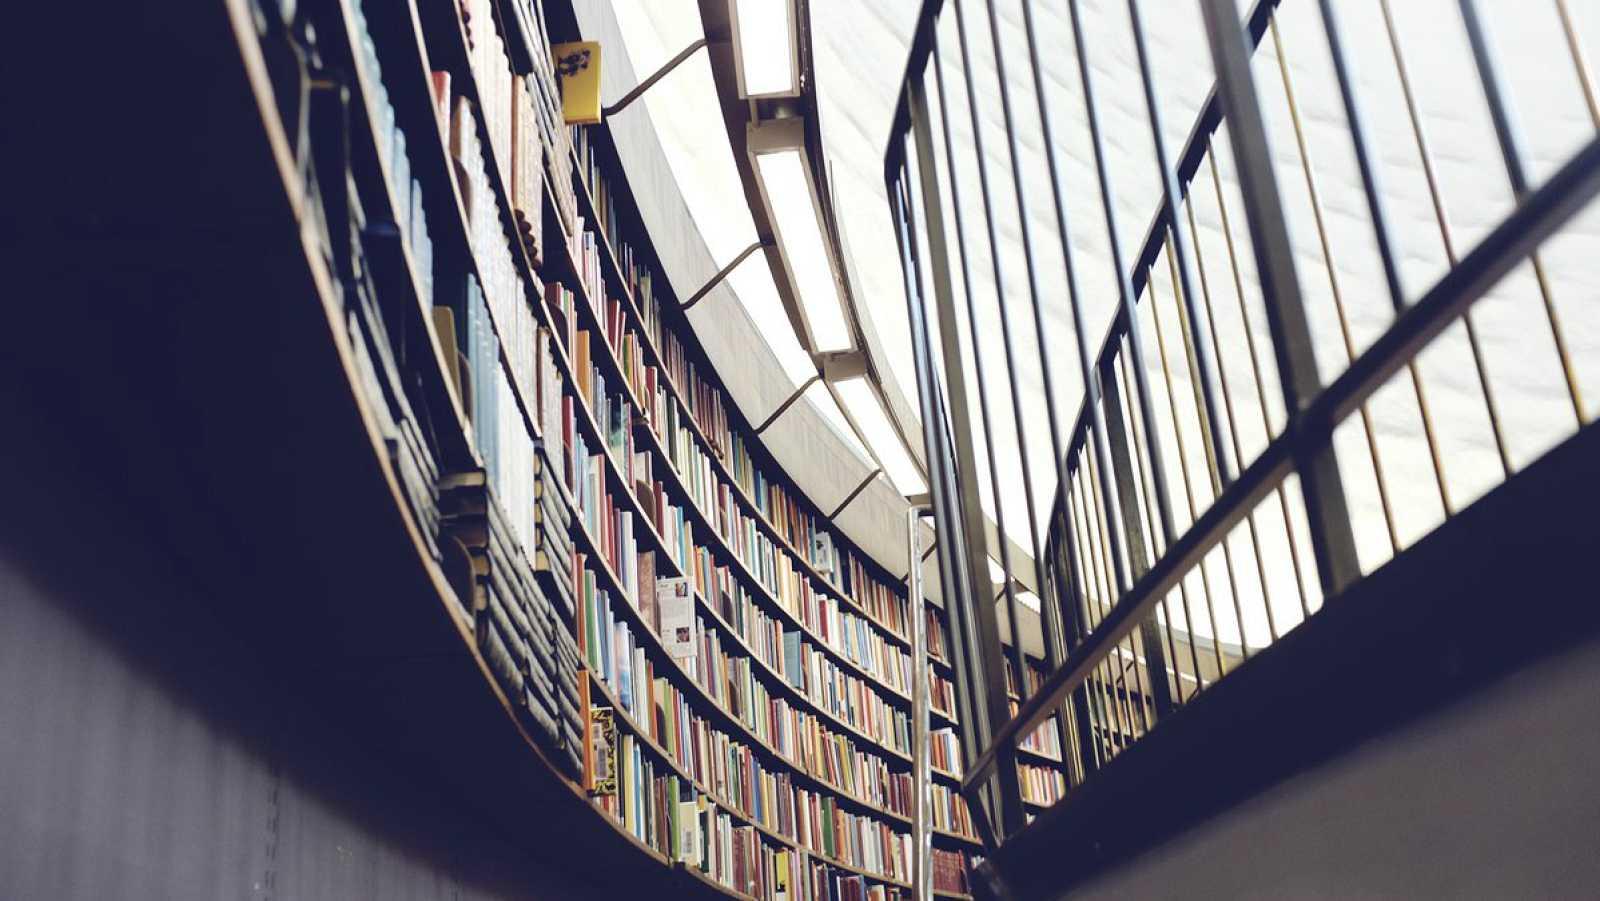 Temas de música - Música medieval en las bibliotecas de hoy: Paris-Bibliothèque National de France (1) - 06/05/17 - escuchar ahora